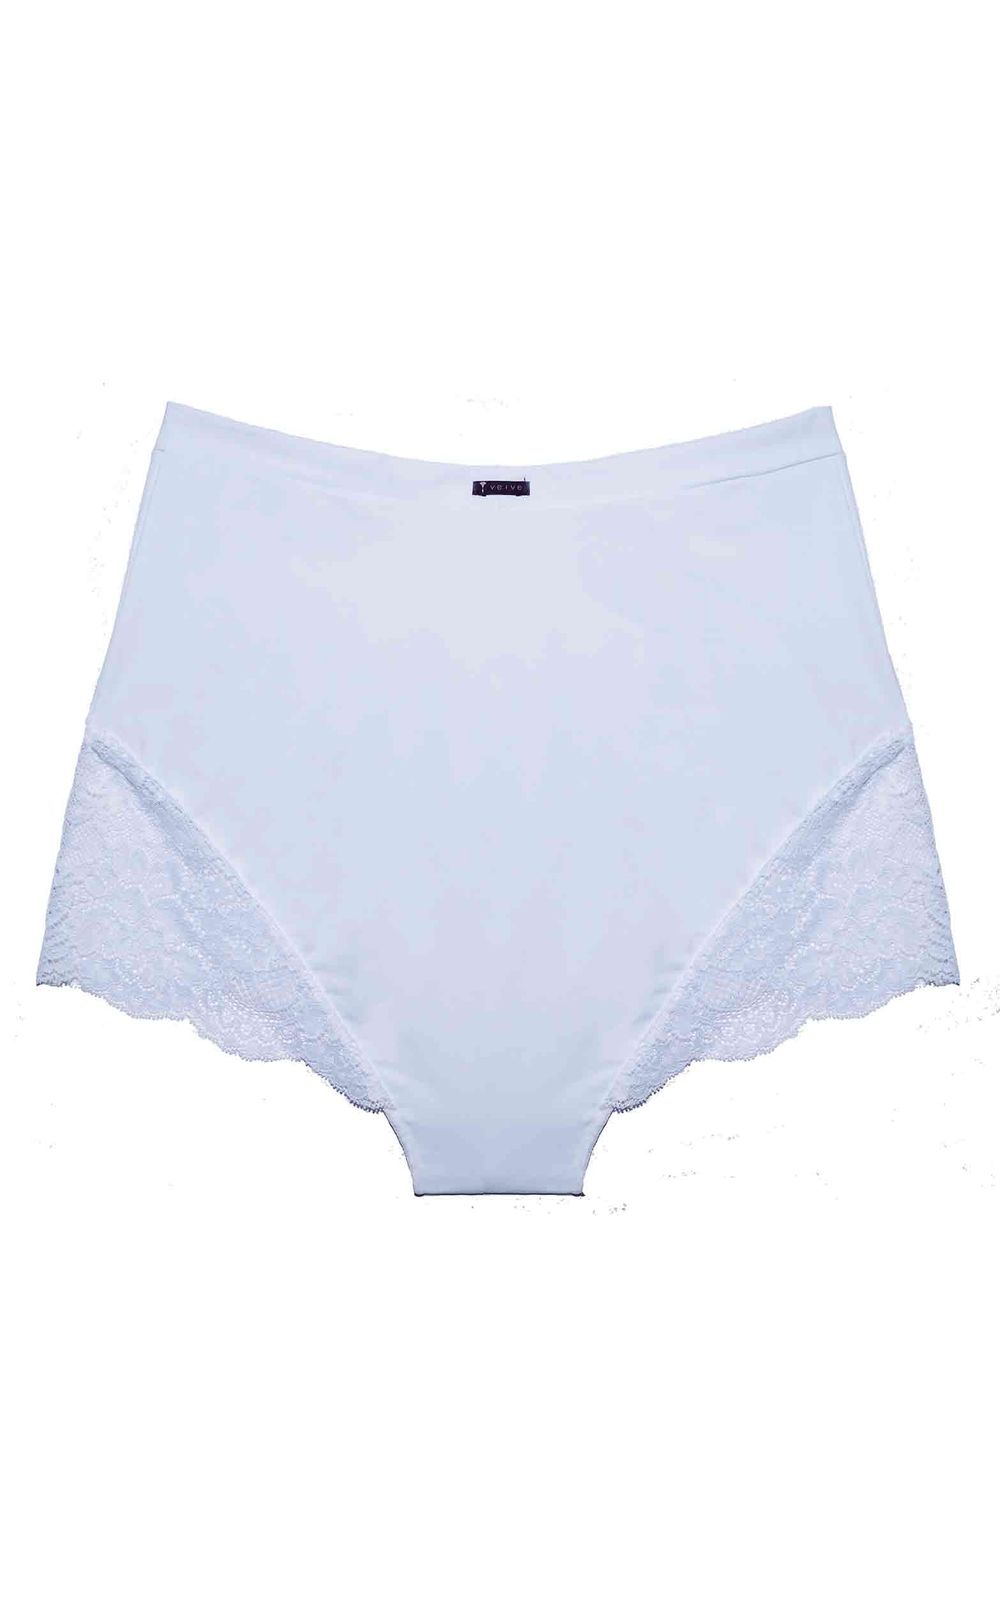 Foto 2 - Calcinha Hot Pants Renda/Tech Pro Branca